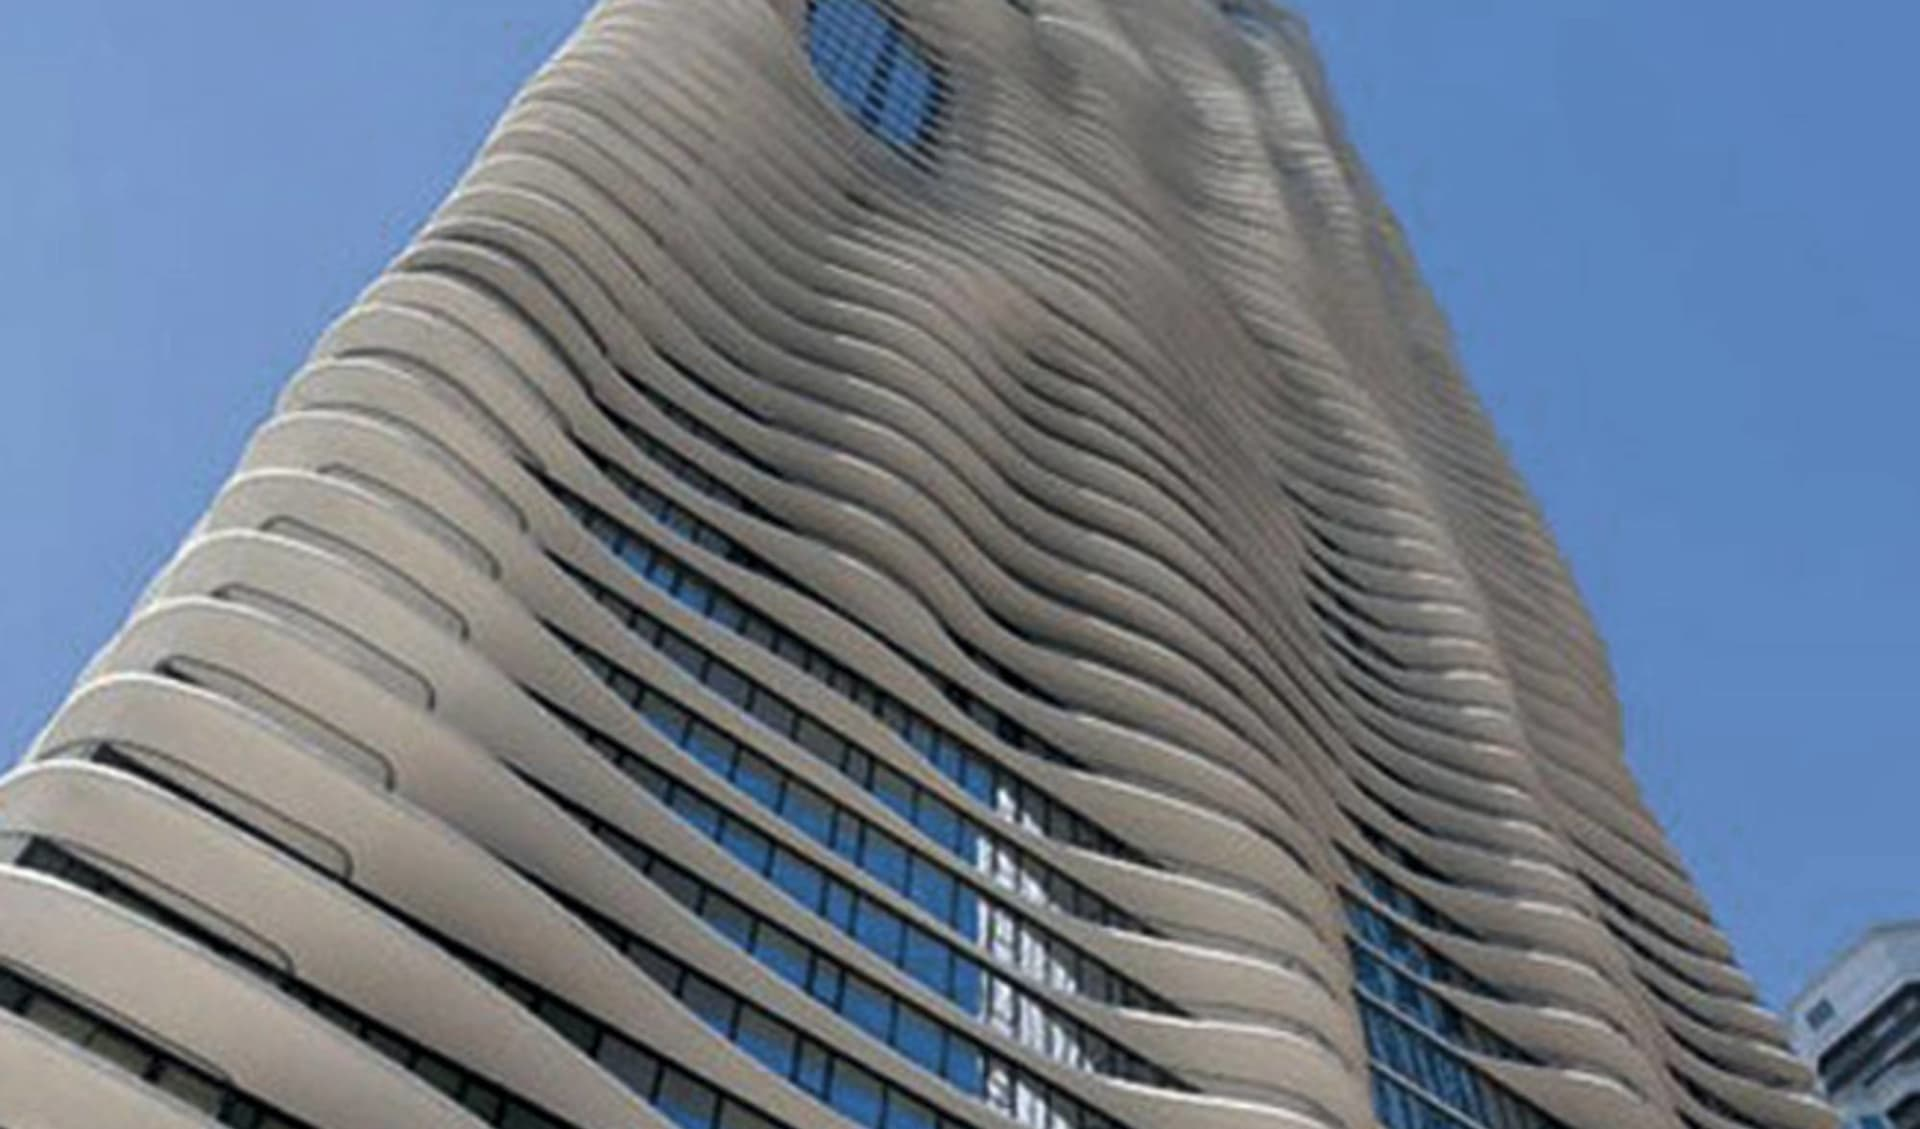 Radisson Blu Aqua Hotel Chicago:  Radisson Blu Aqua - Hotelansicht